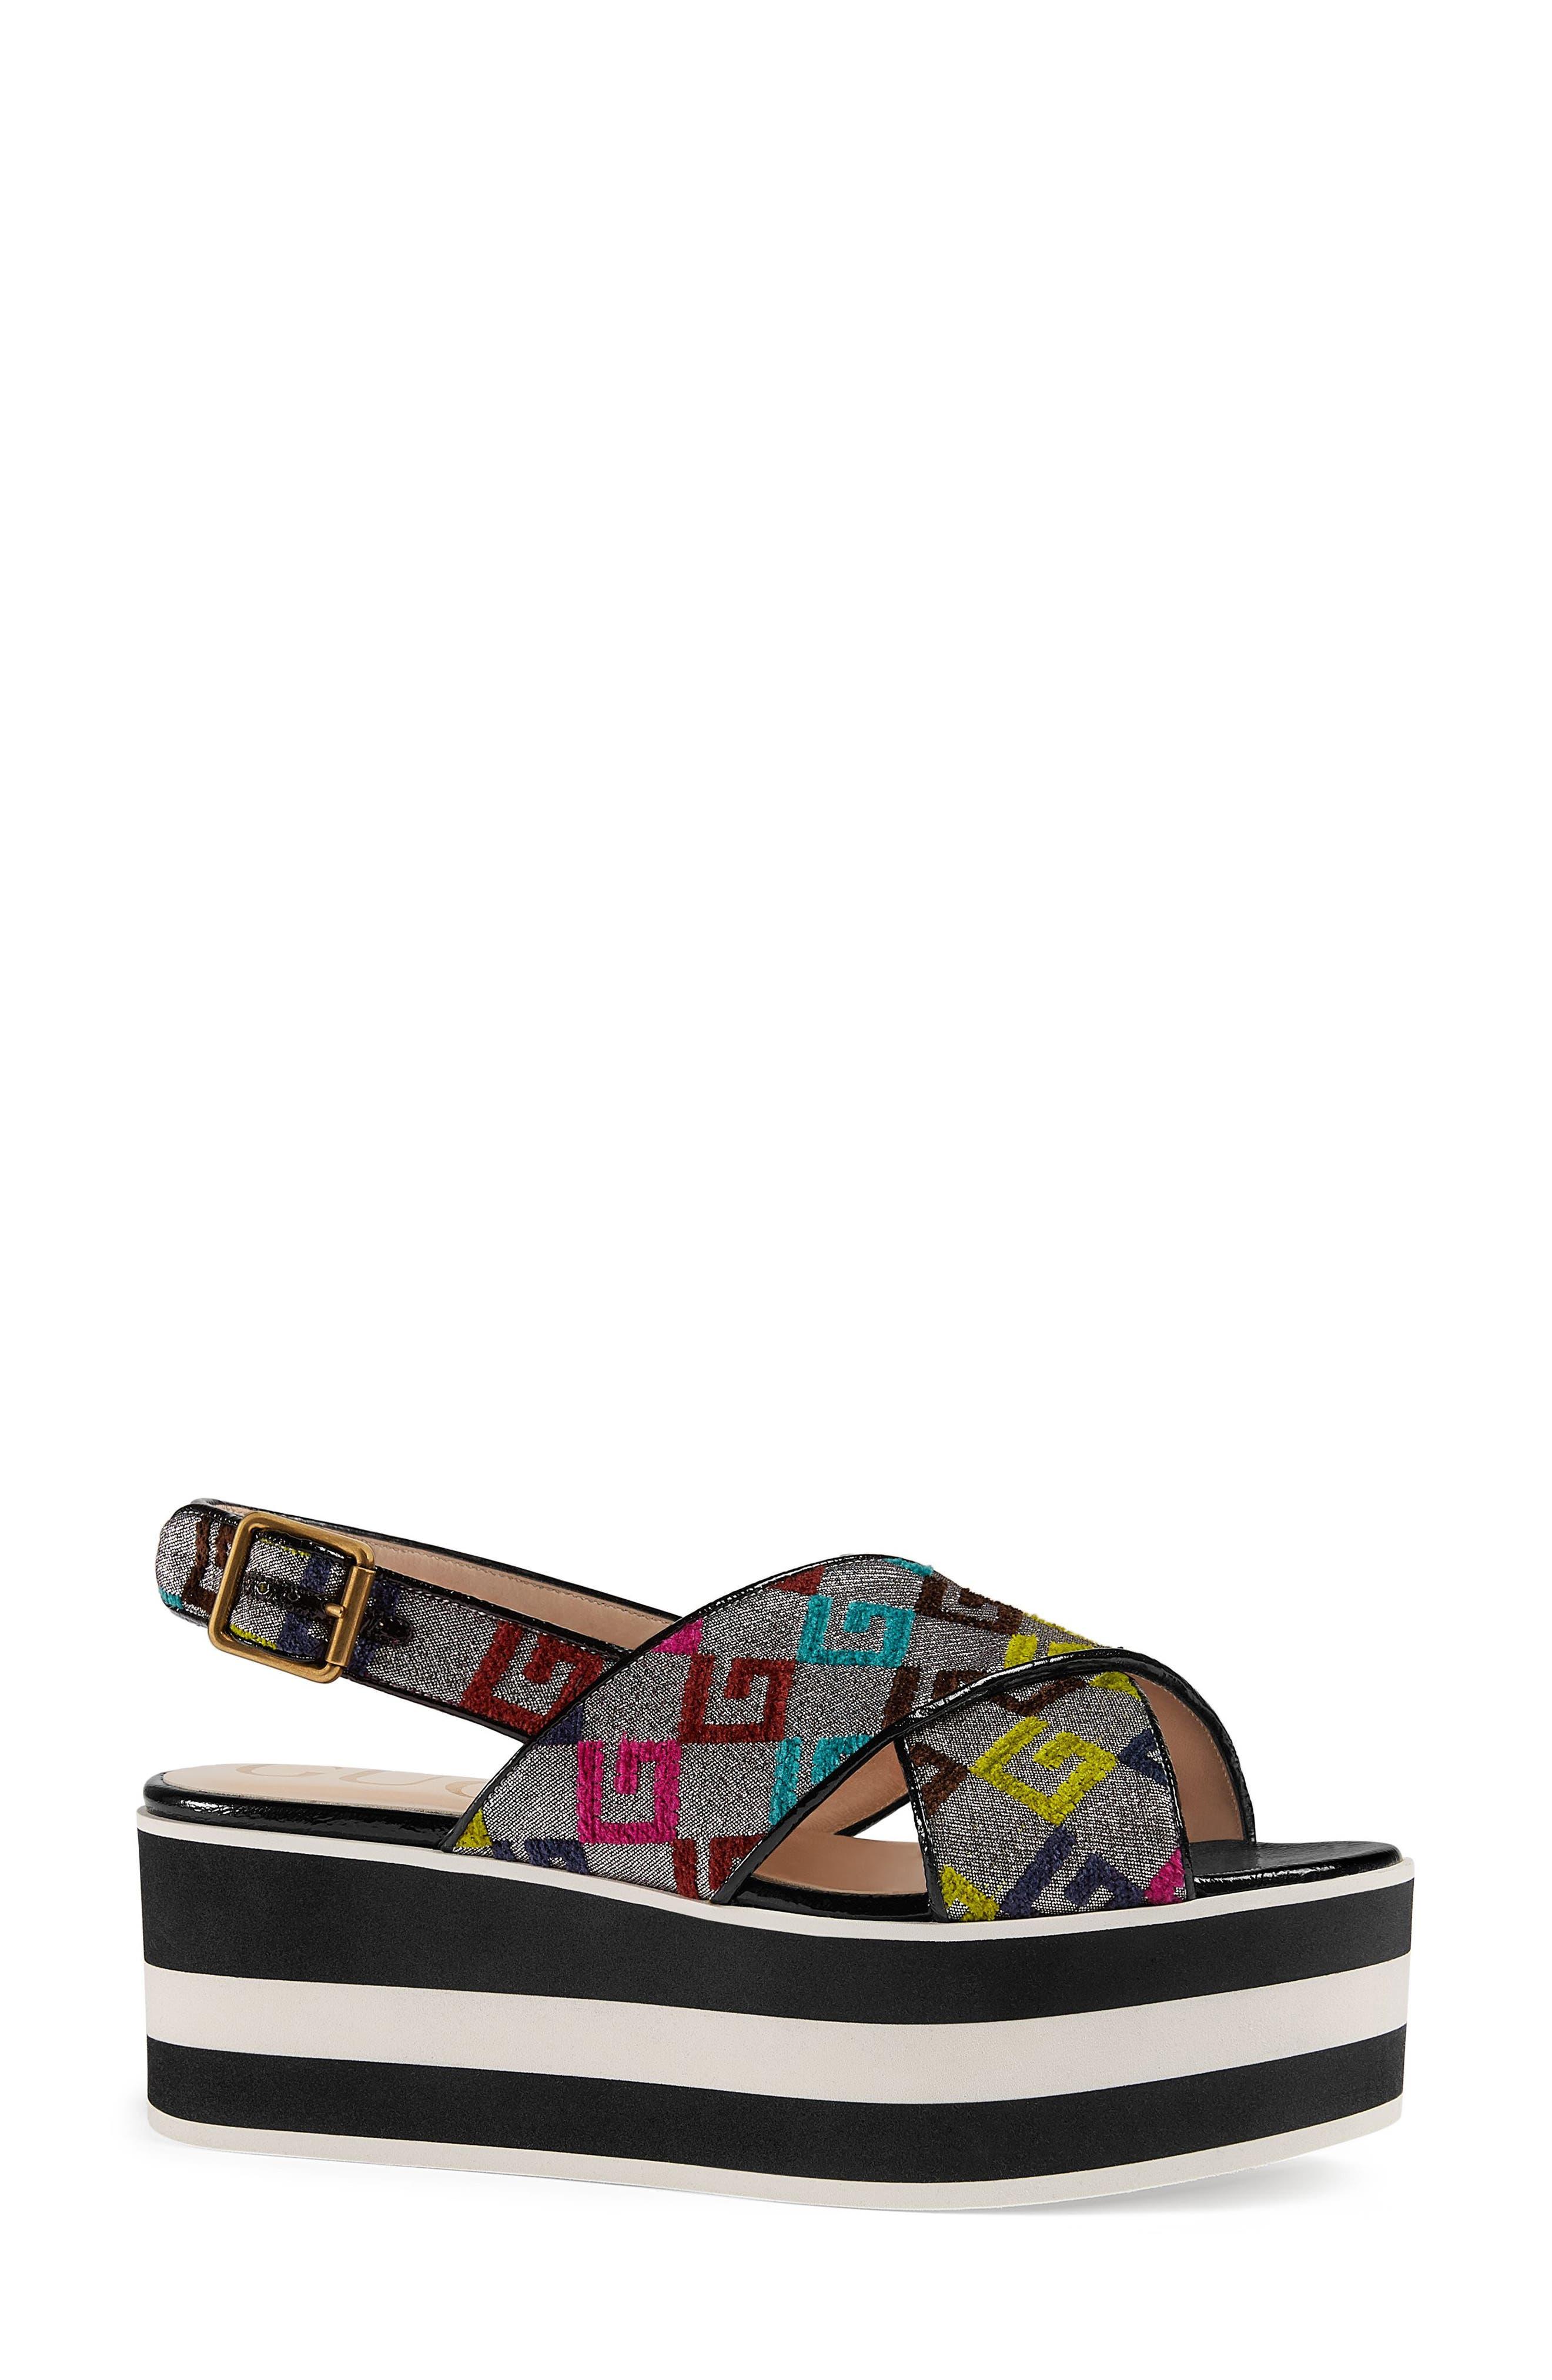 Peggy Flatform Sandal,                             Main thumbnail 1, color,                             047